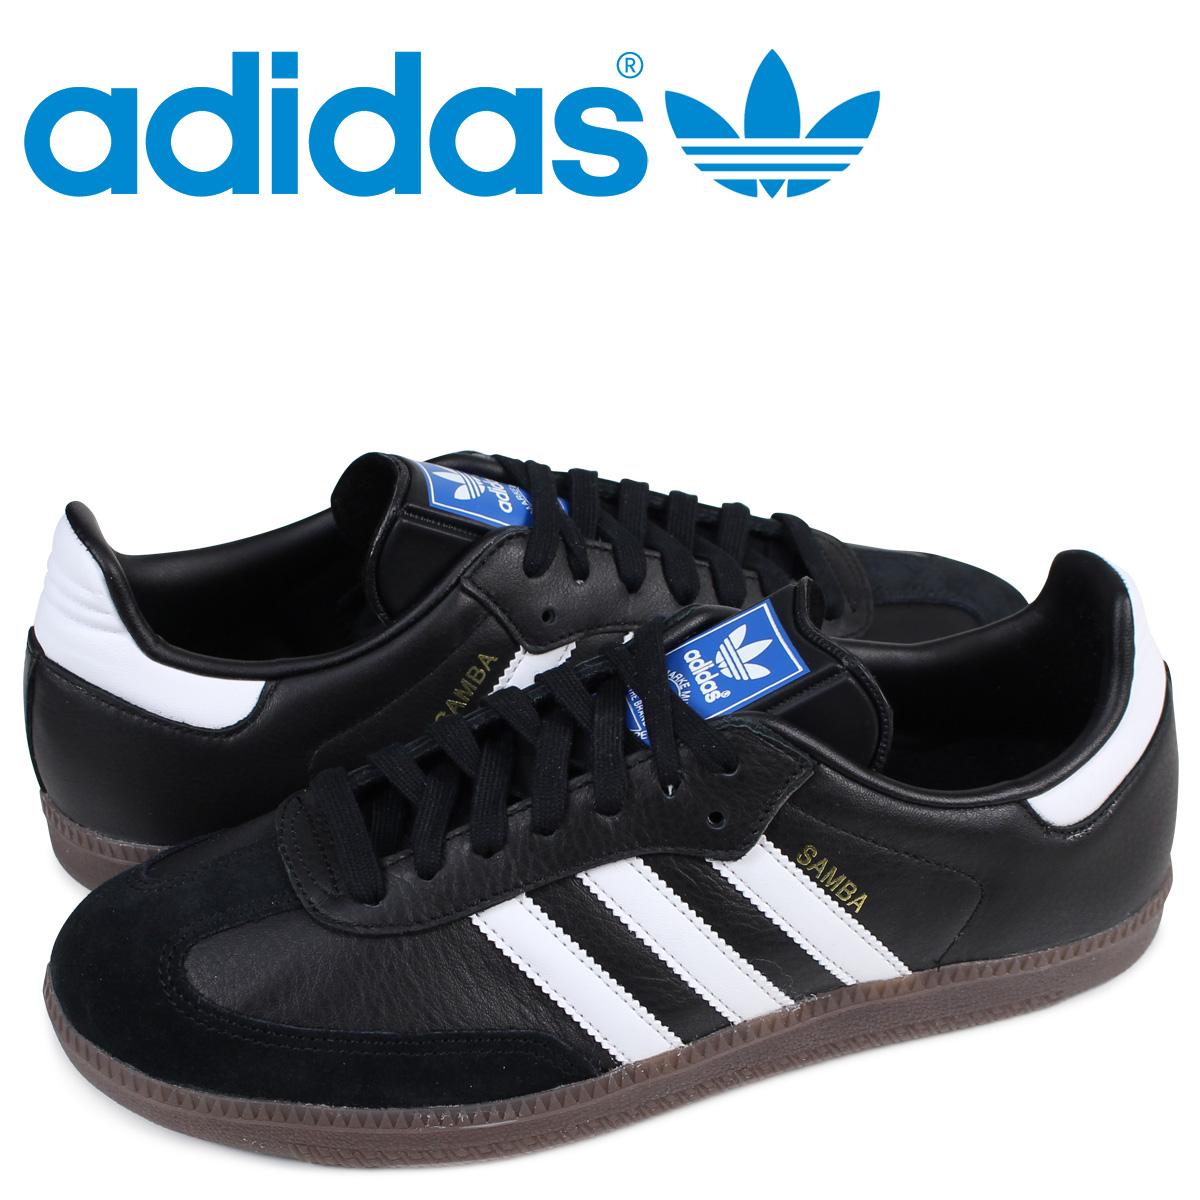 b68bc97bd4 Adidas samba adidas originals sneakers SAMBA men BZ0058 shoes black  originals  1 30 Shinnyu load